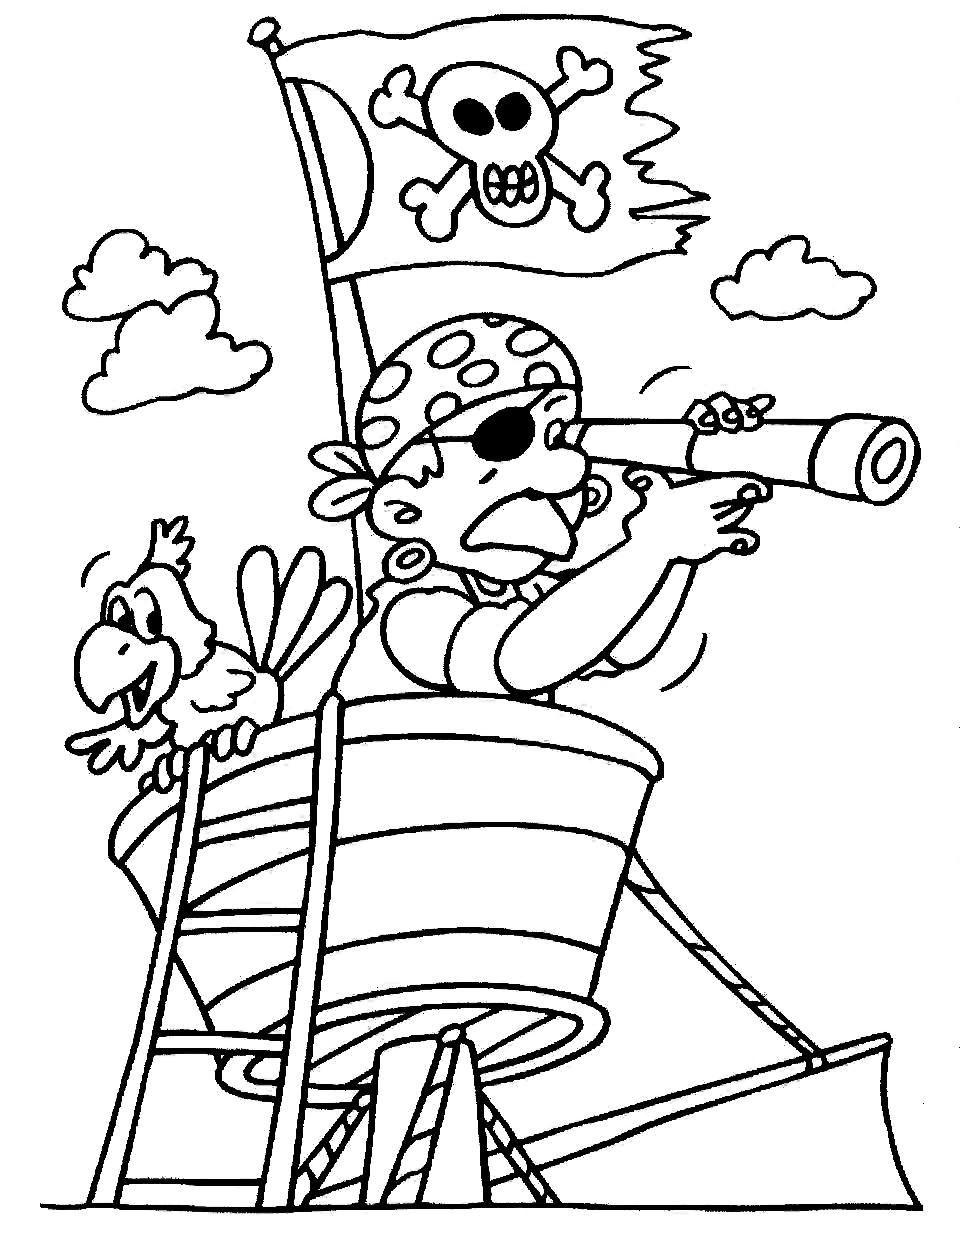 kleurplaat piratenvlag kidkleurplaat nl